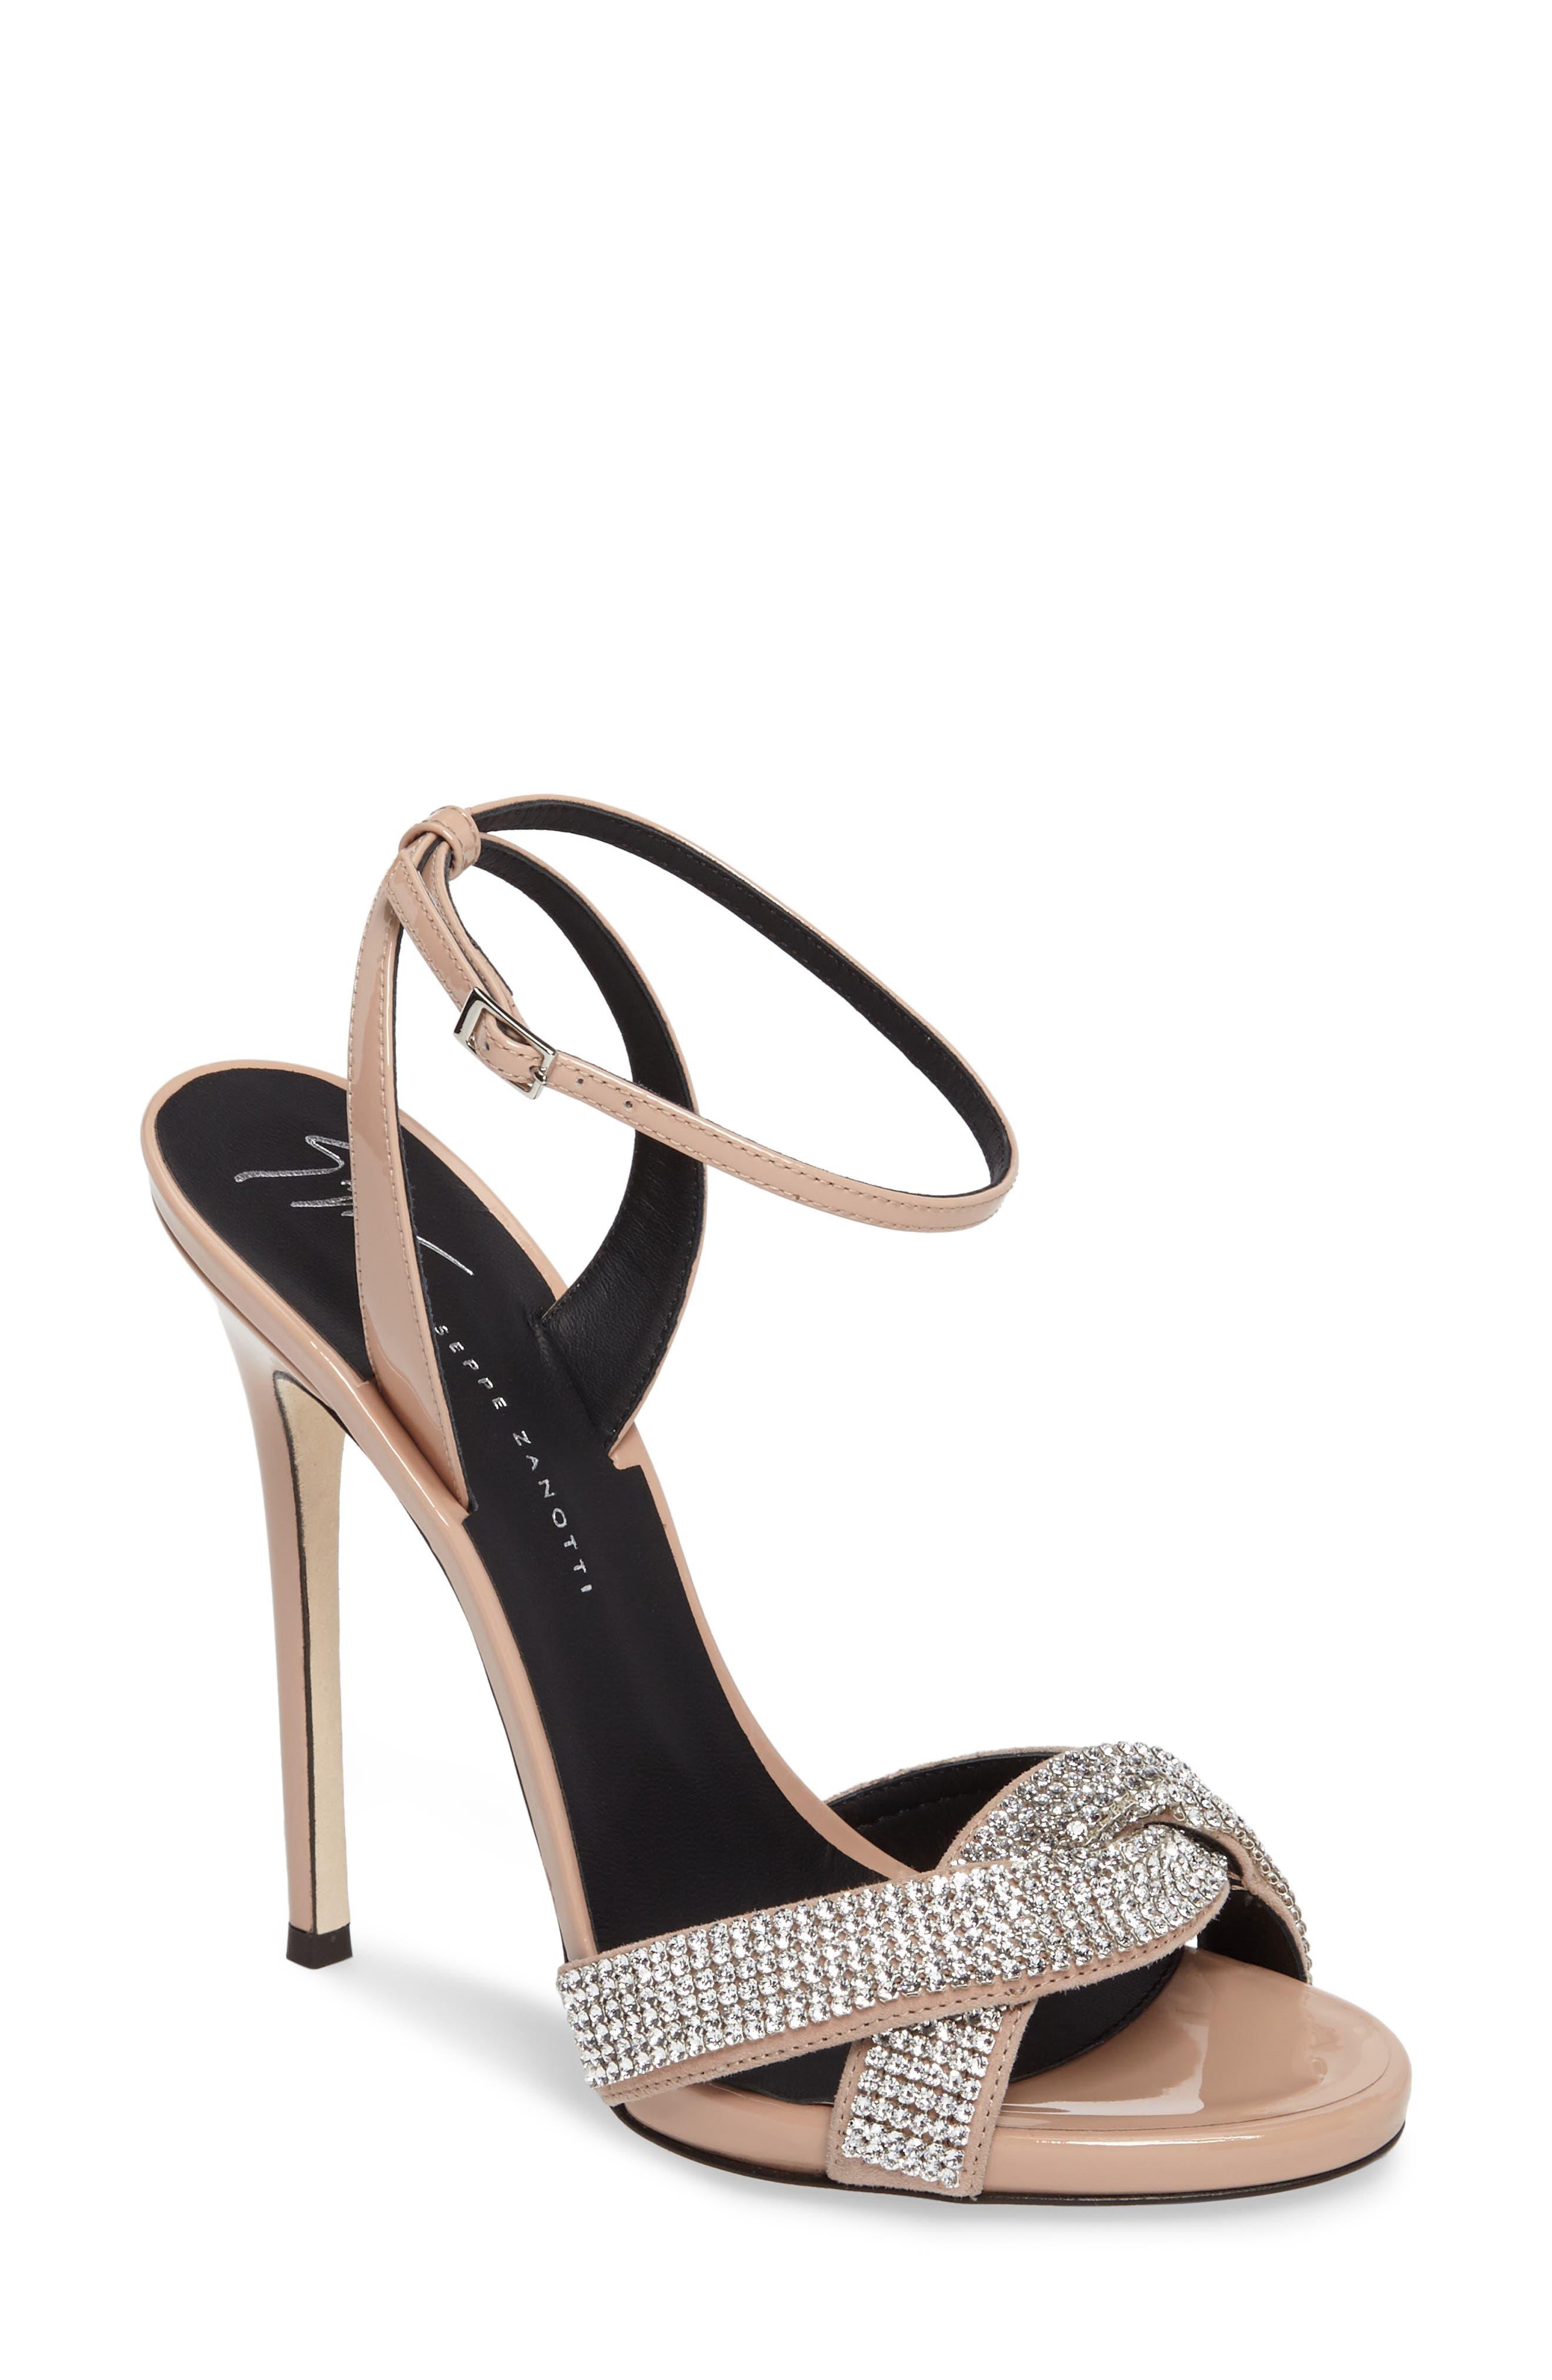 Alternate Image 1 Selected - Giuseppe Zanotti Embellished Wrap Strap Sandal (Women)